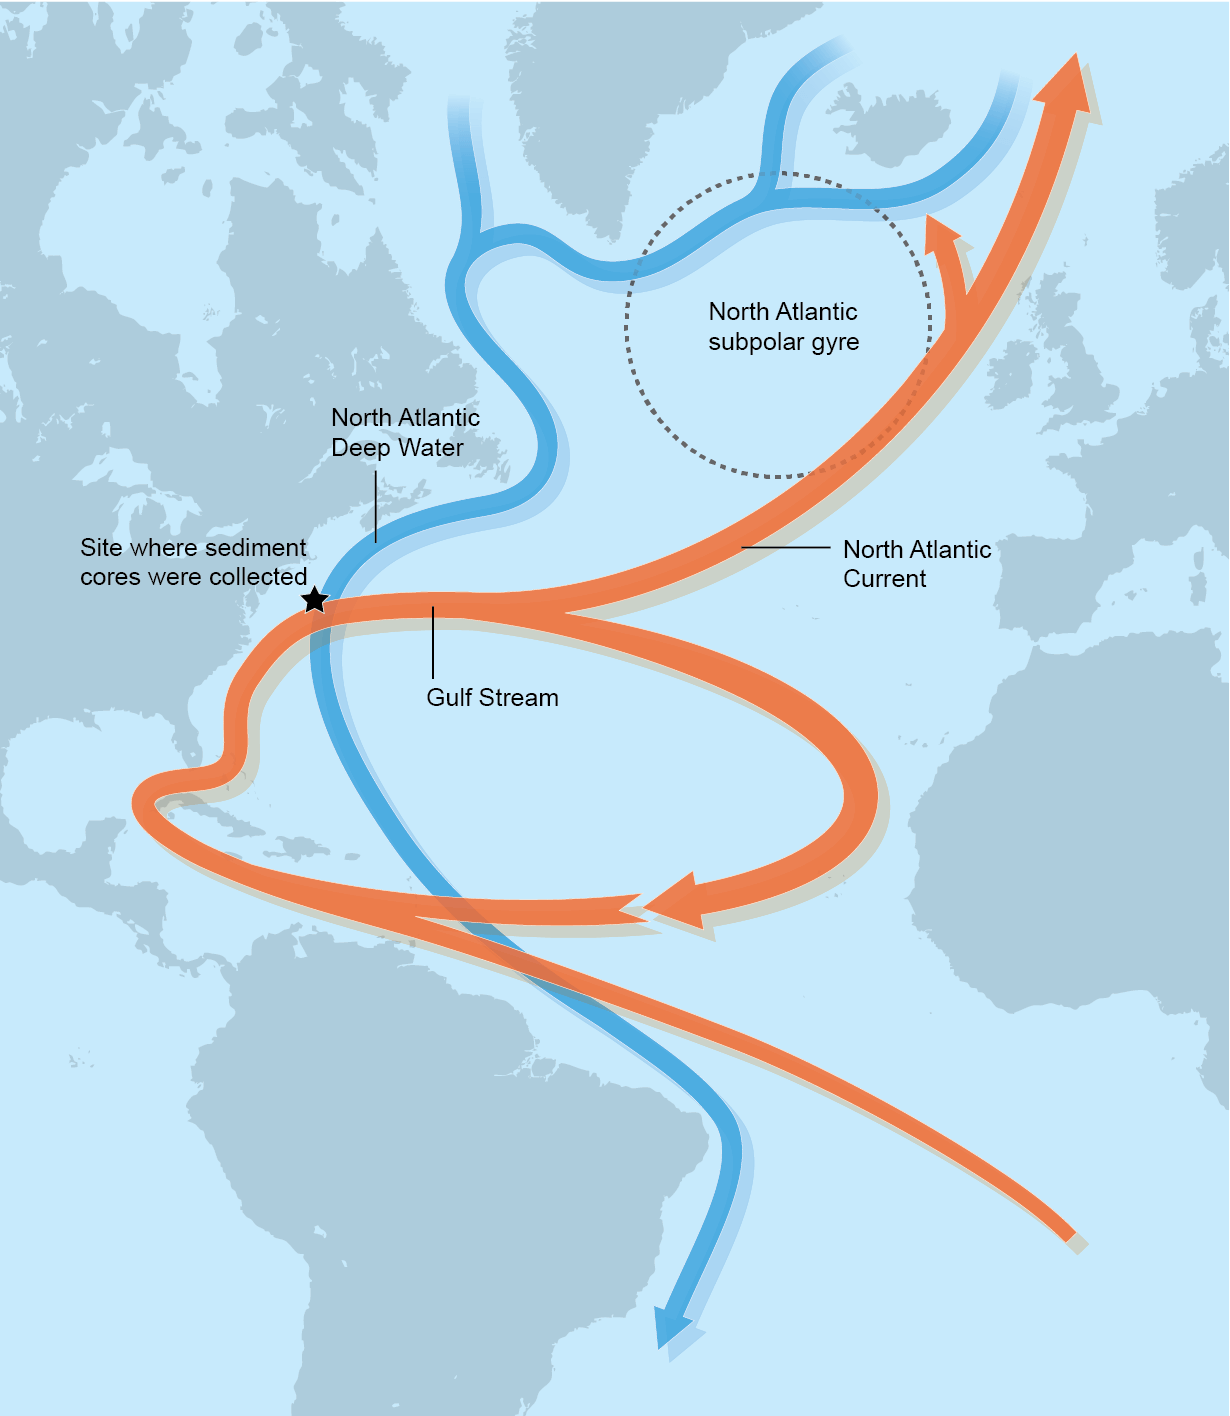 united-states-europe-gulf-stream-AMOC-circulation-diagram